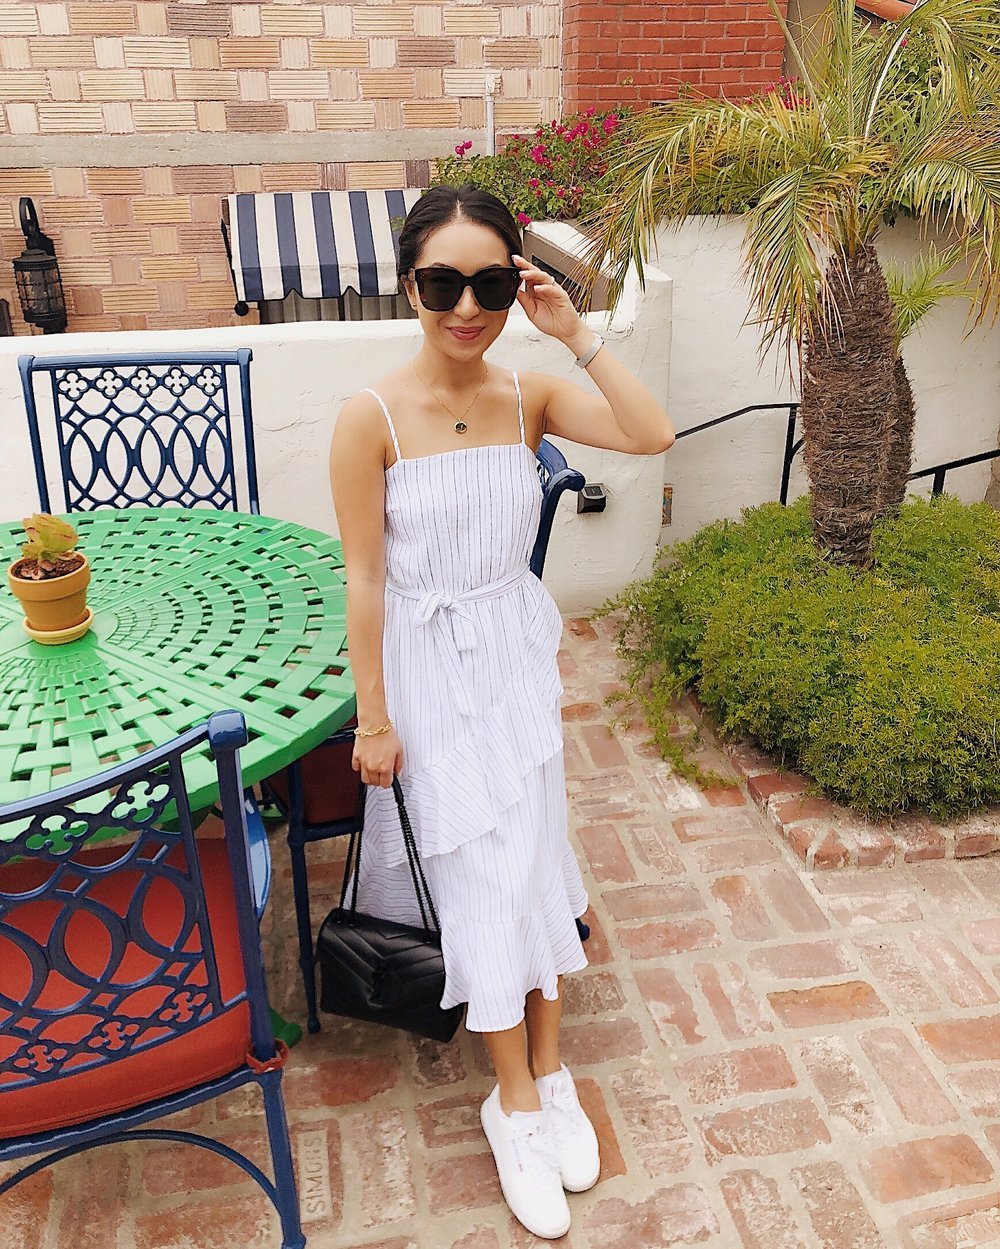 resort style - Dress: ArtemesiaBag: Saint LaurentShoes: Reebok Classics